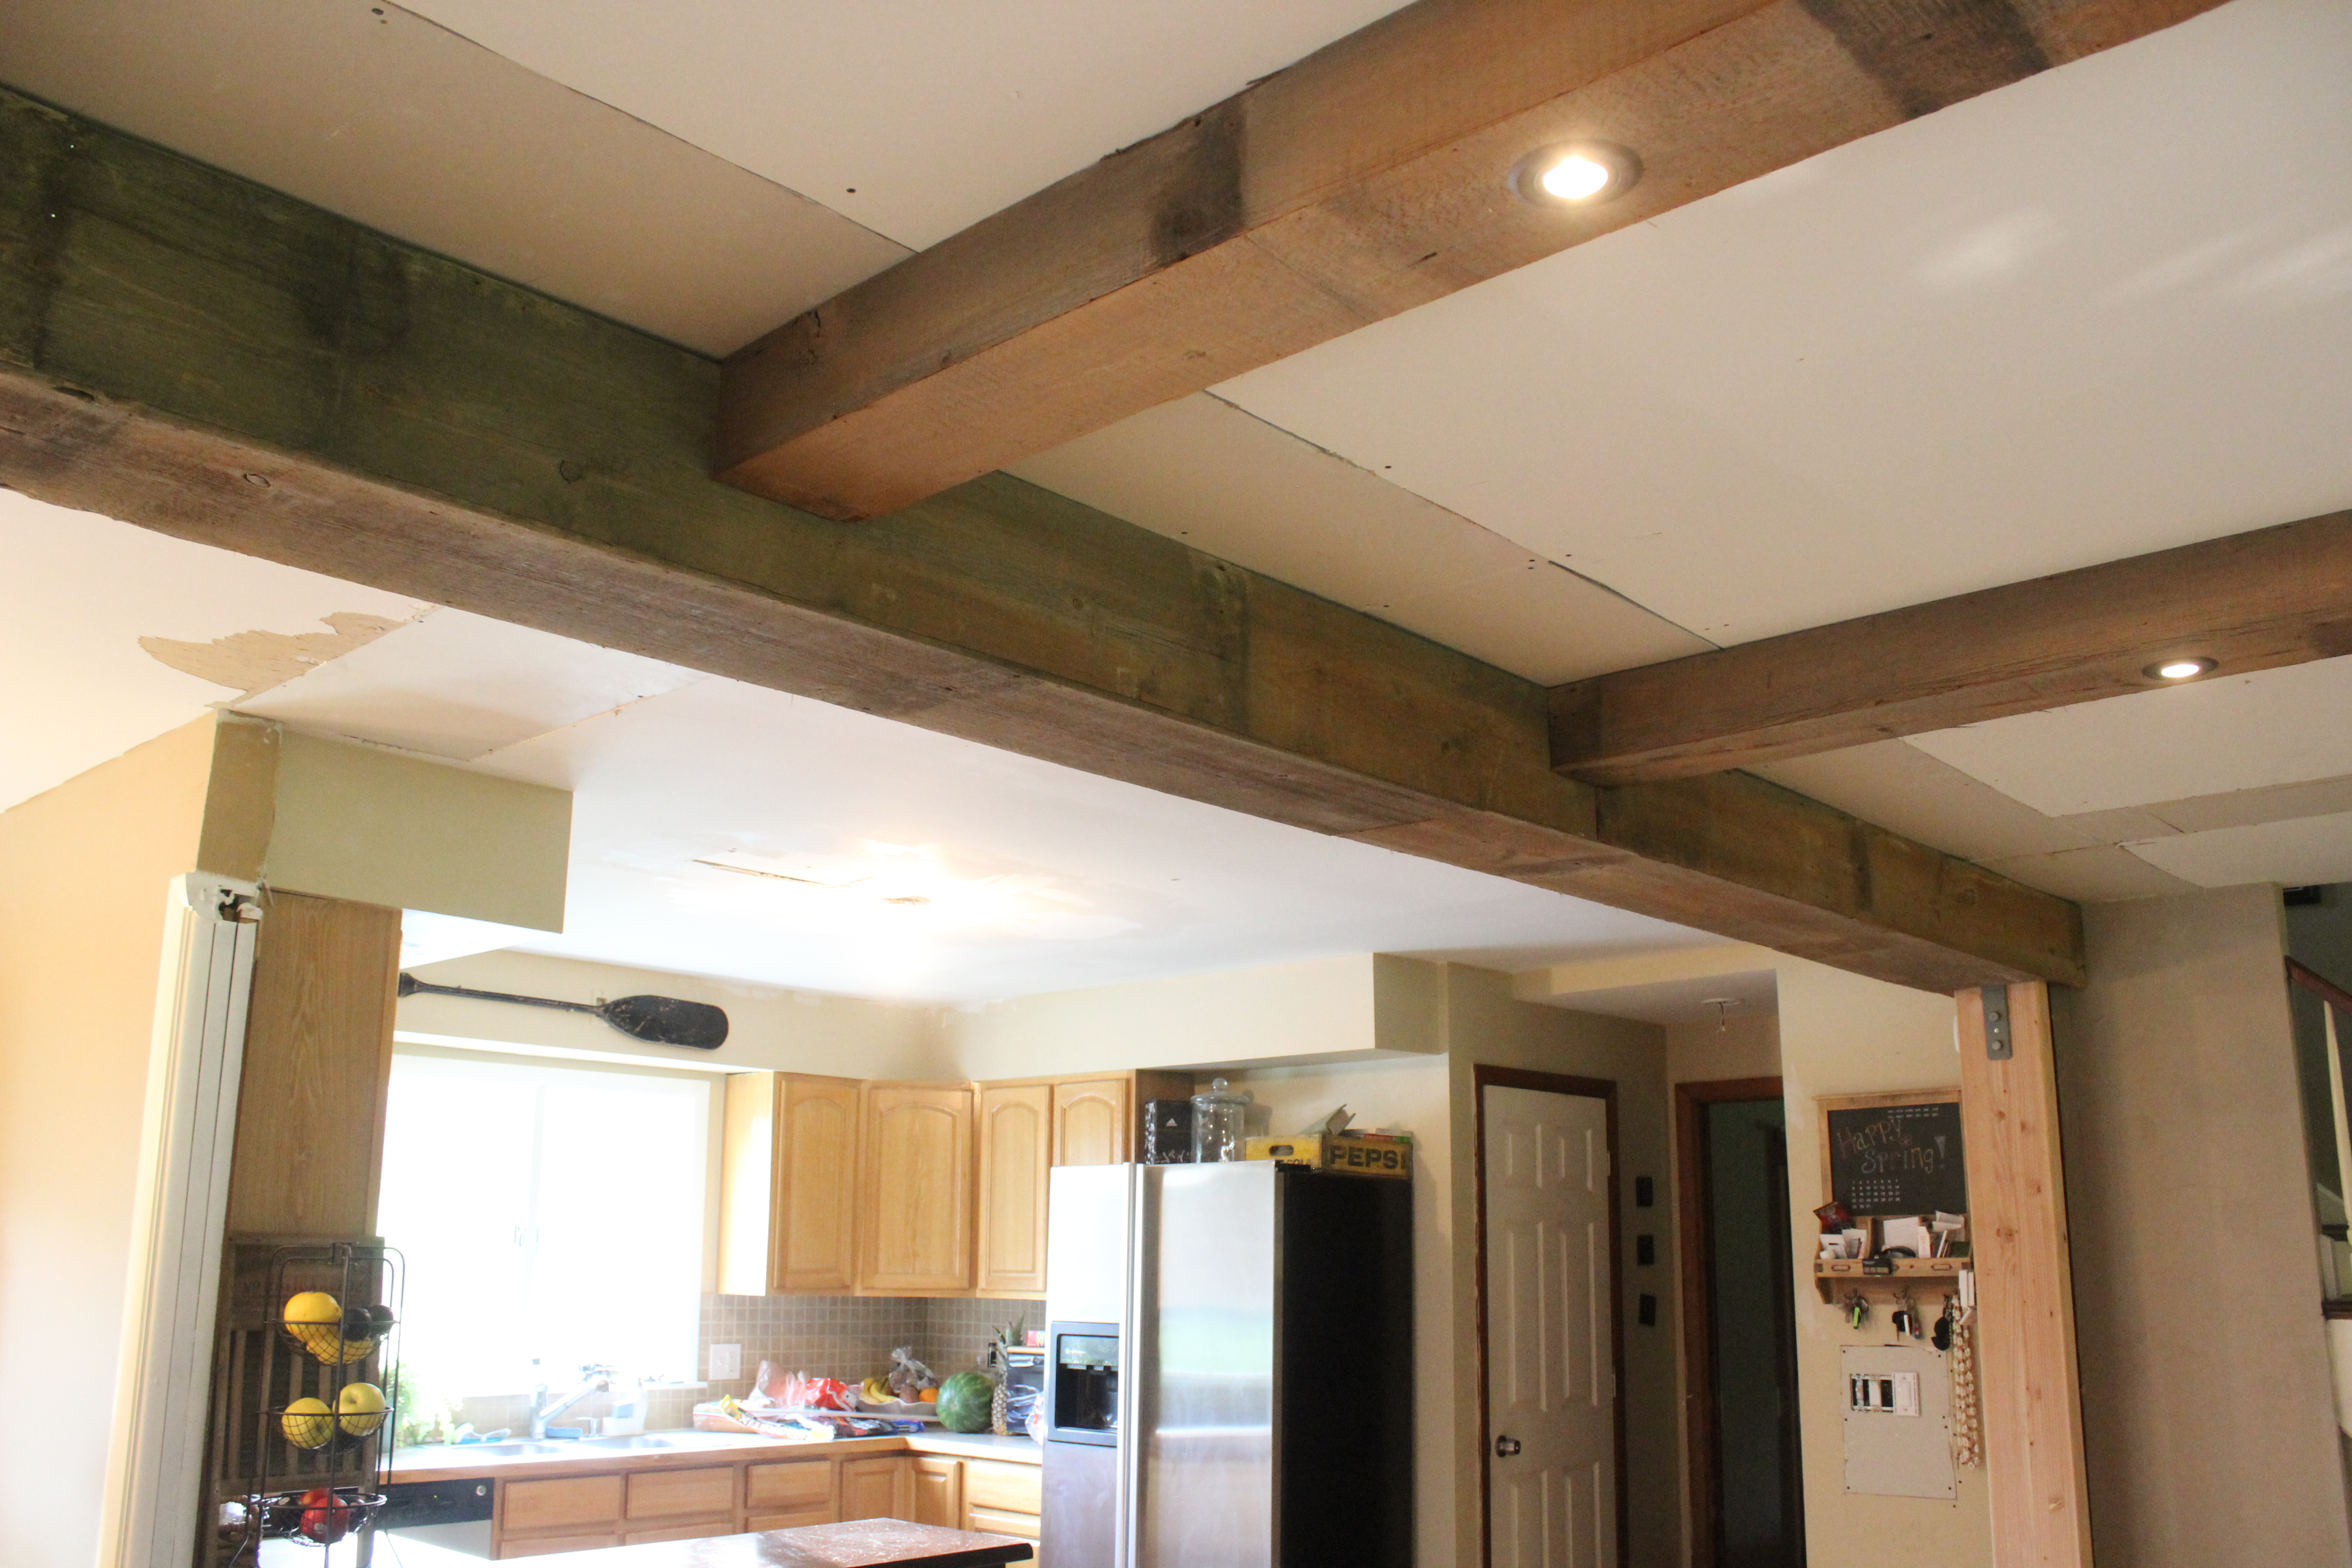 DIY Reclaimed Barn Wood Beams